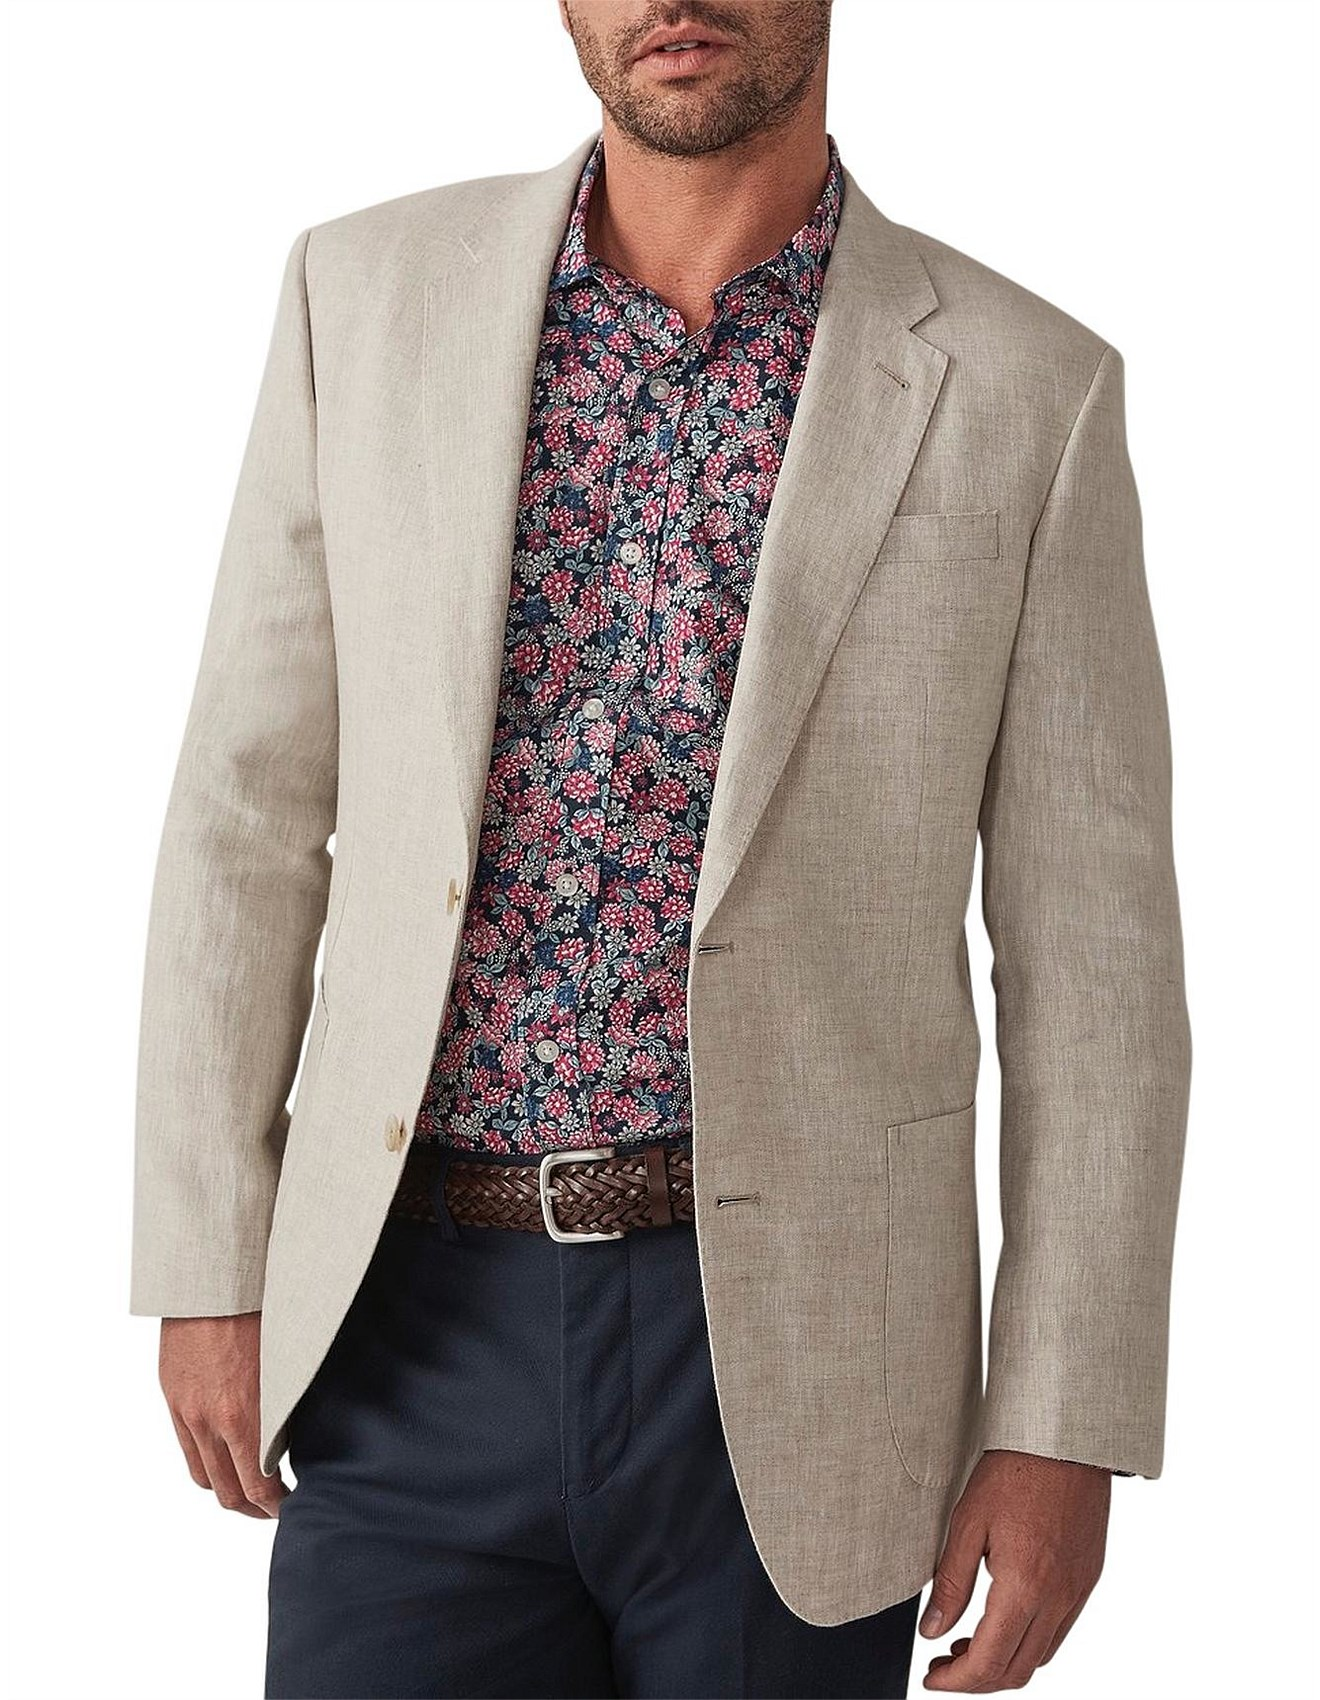 Men's Fashion | Buy Men's Clothing Online | David Jones